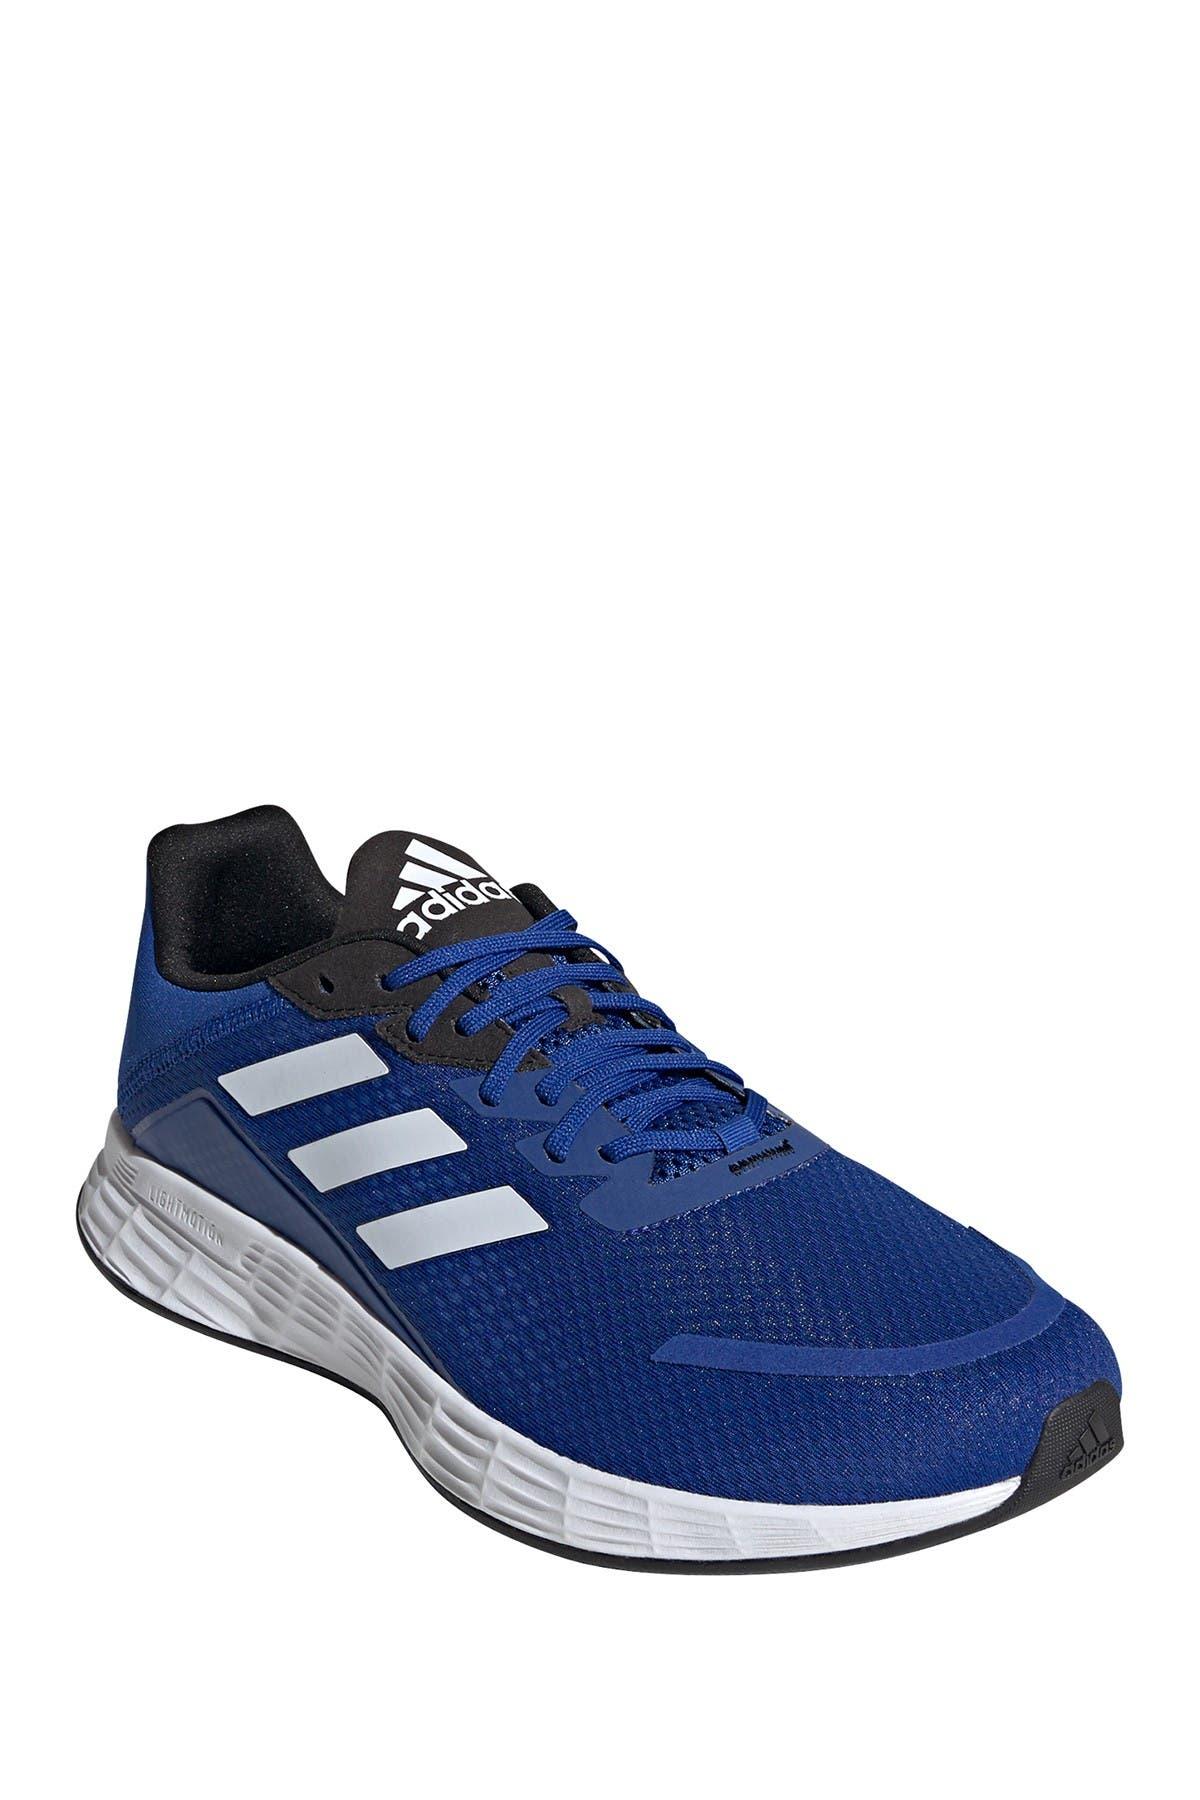 Image of adidas Duramo SL Running Sneaker - Wide Width